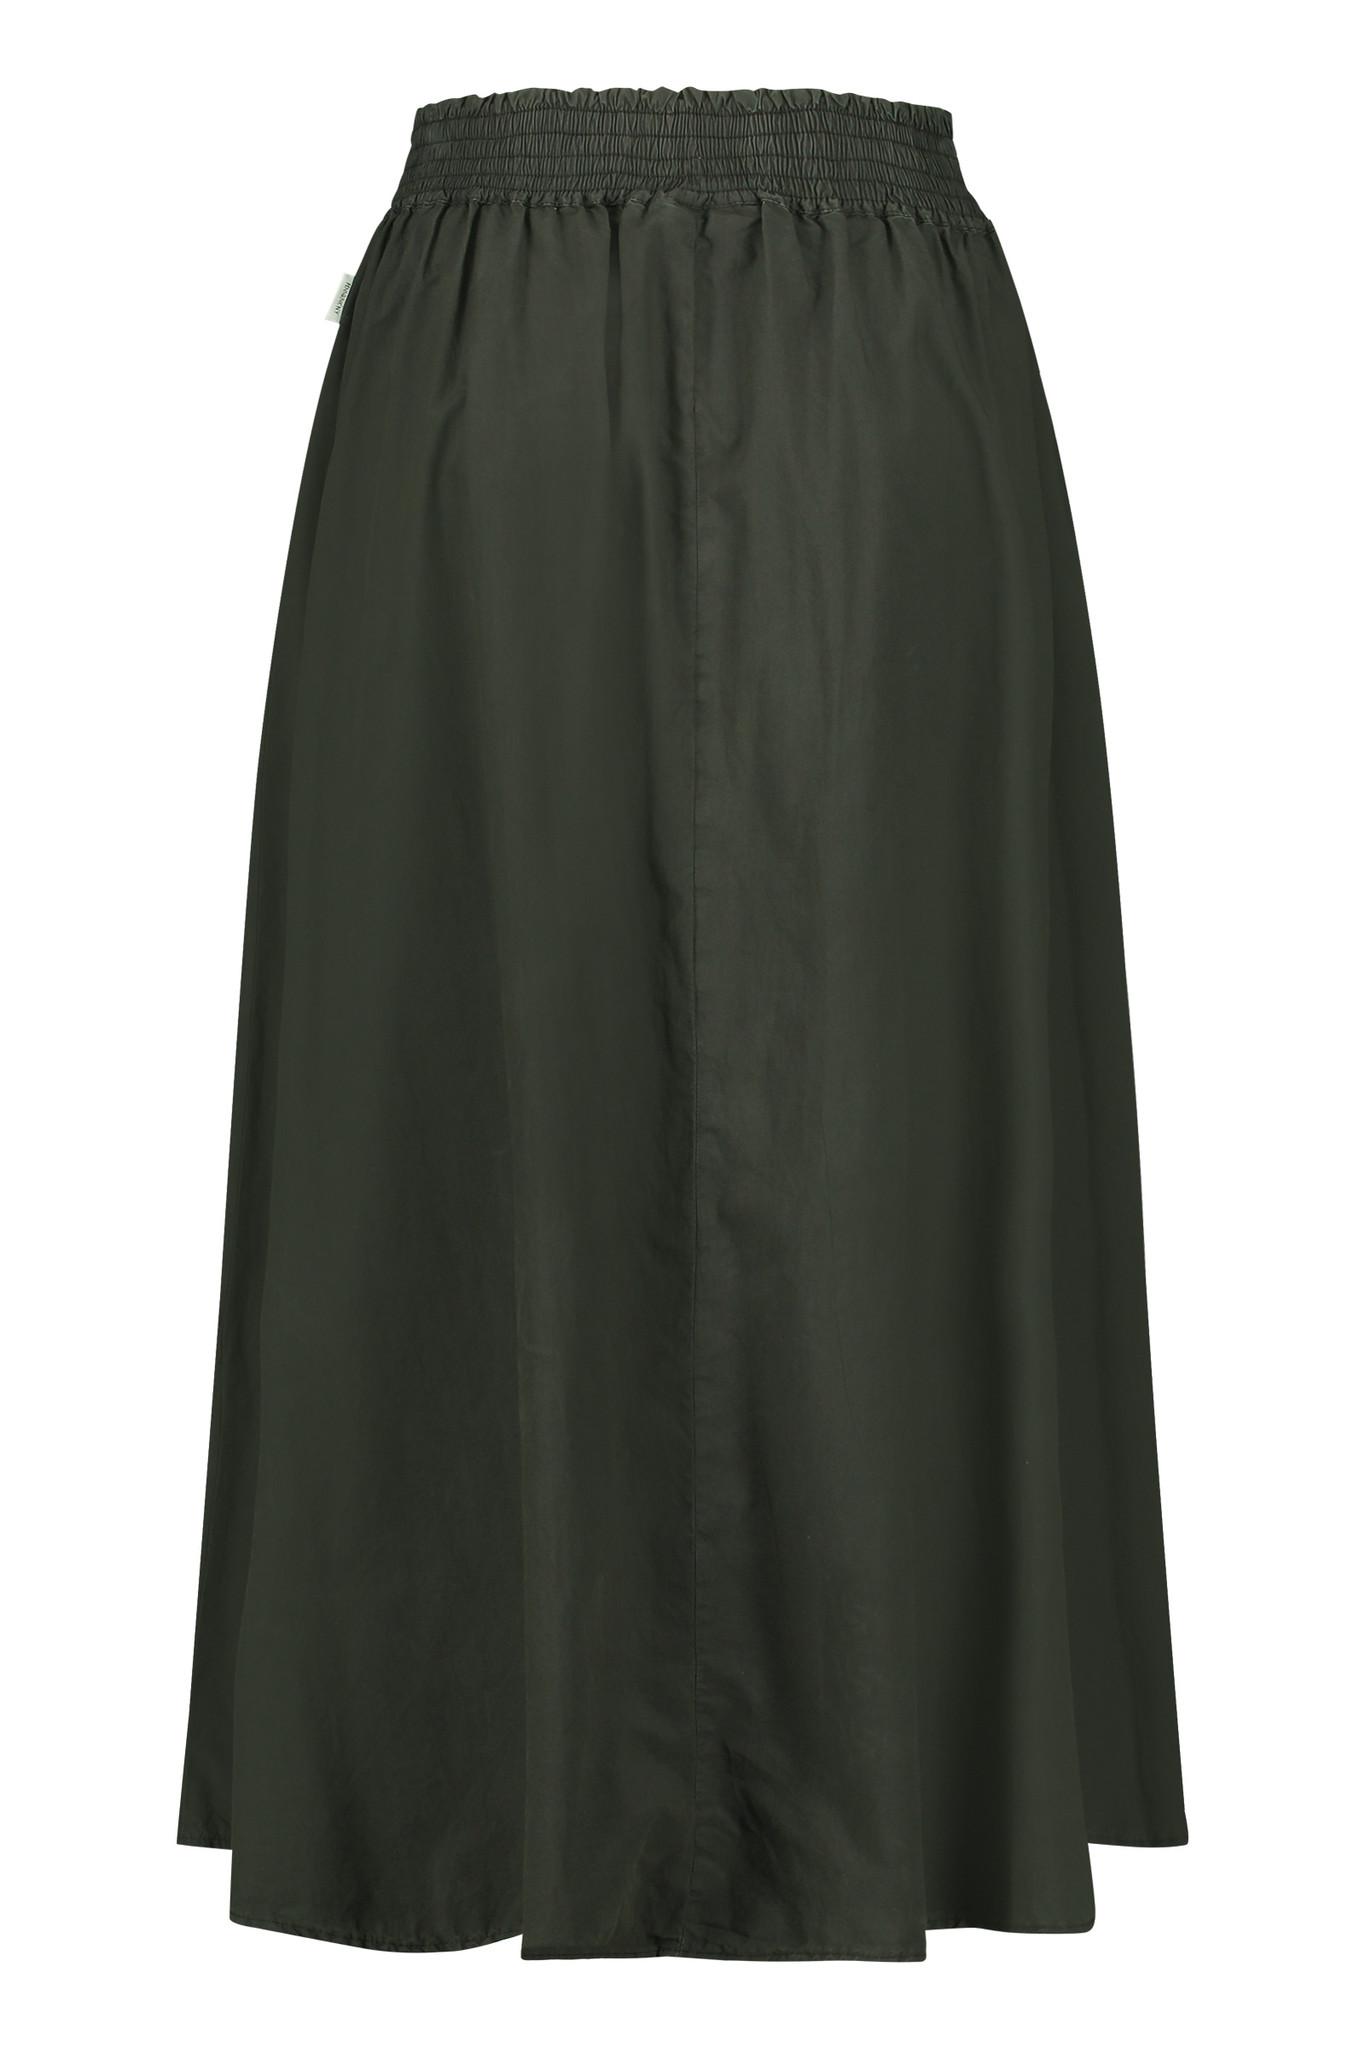 Penn & Ink Skirt W21W366-2